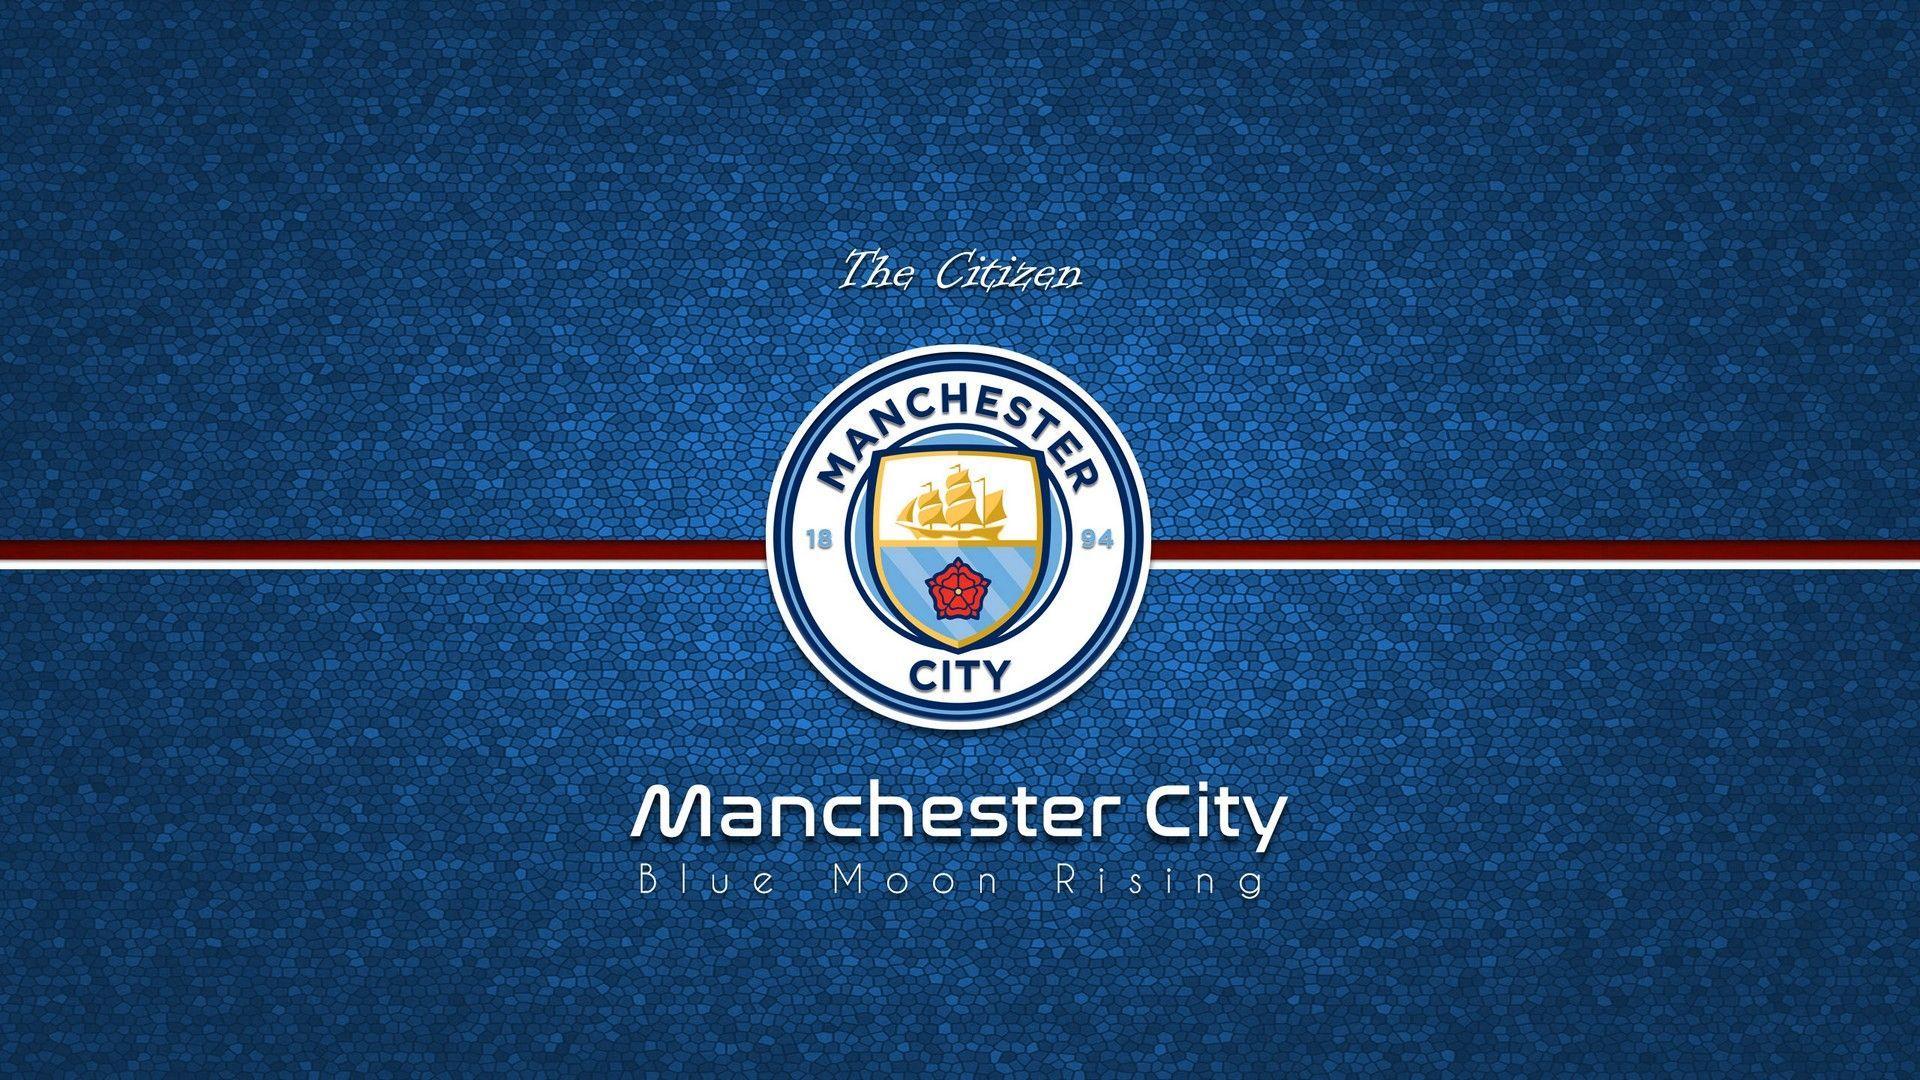 Manchester City Desktop Wallpapers Top Free Manchester City Desktop Backgrounds Wallpaperaccess